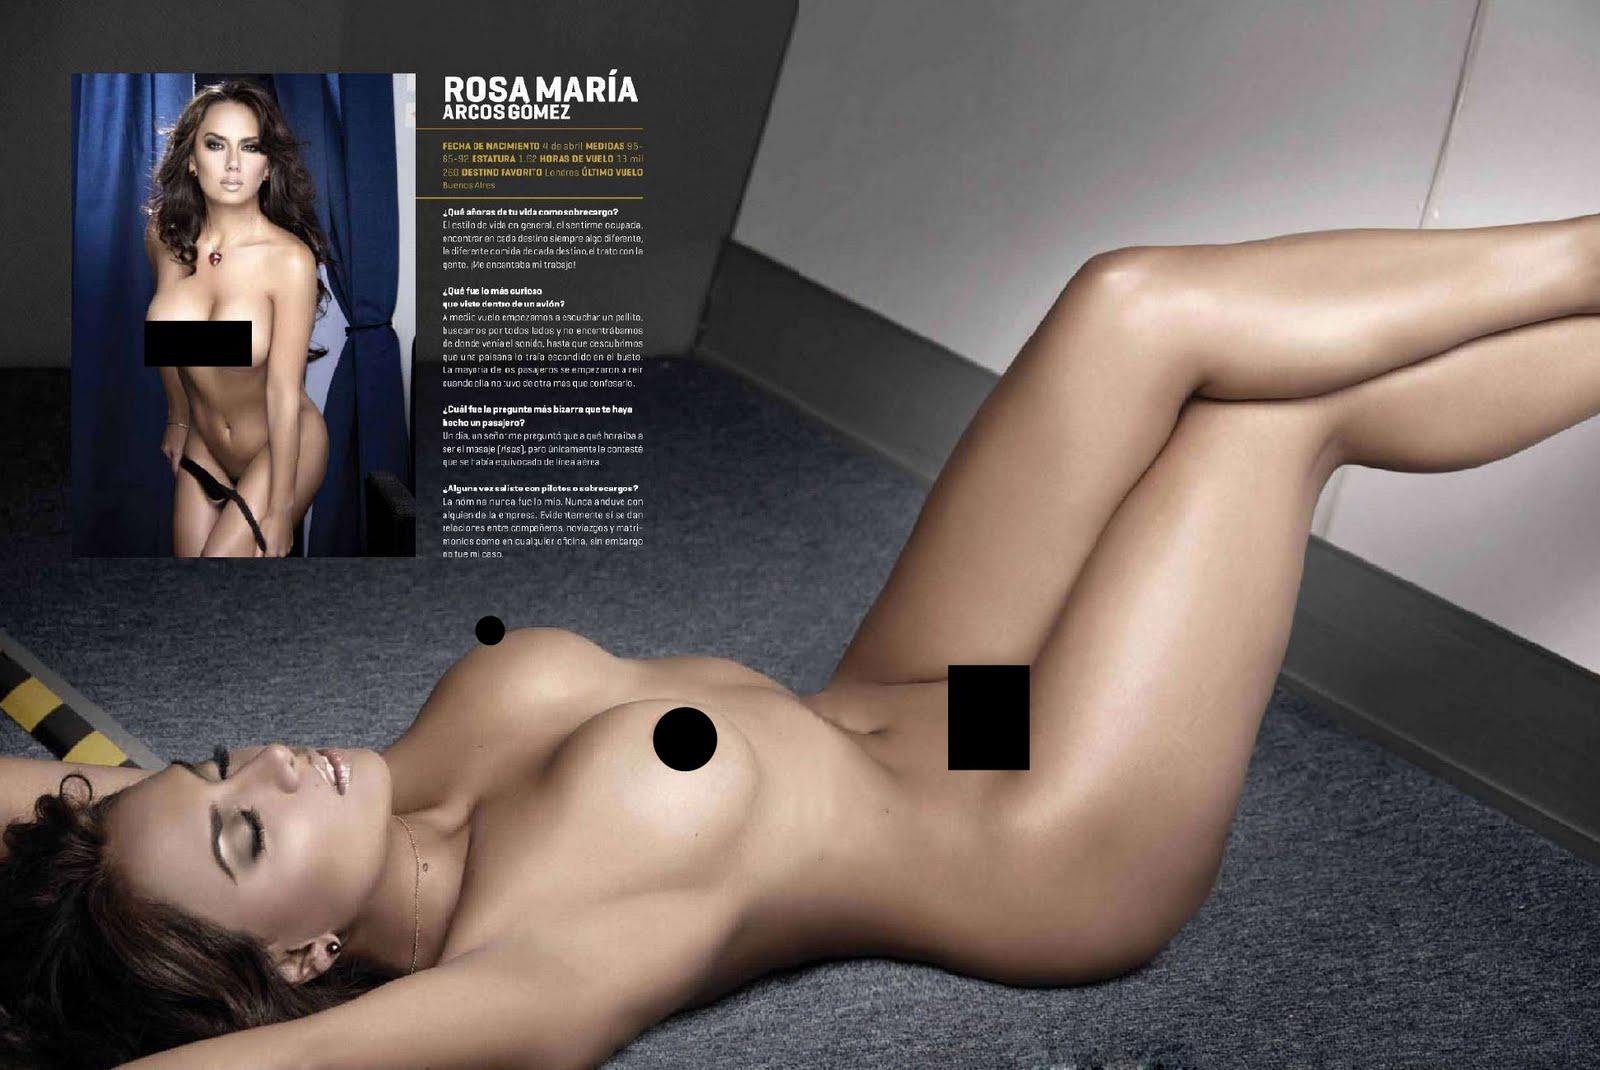 Playboy mexicana flight attendants nude